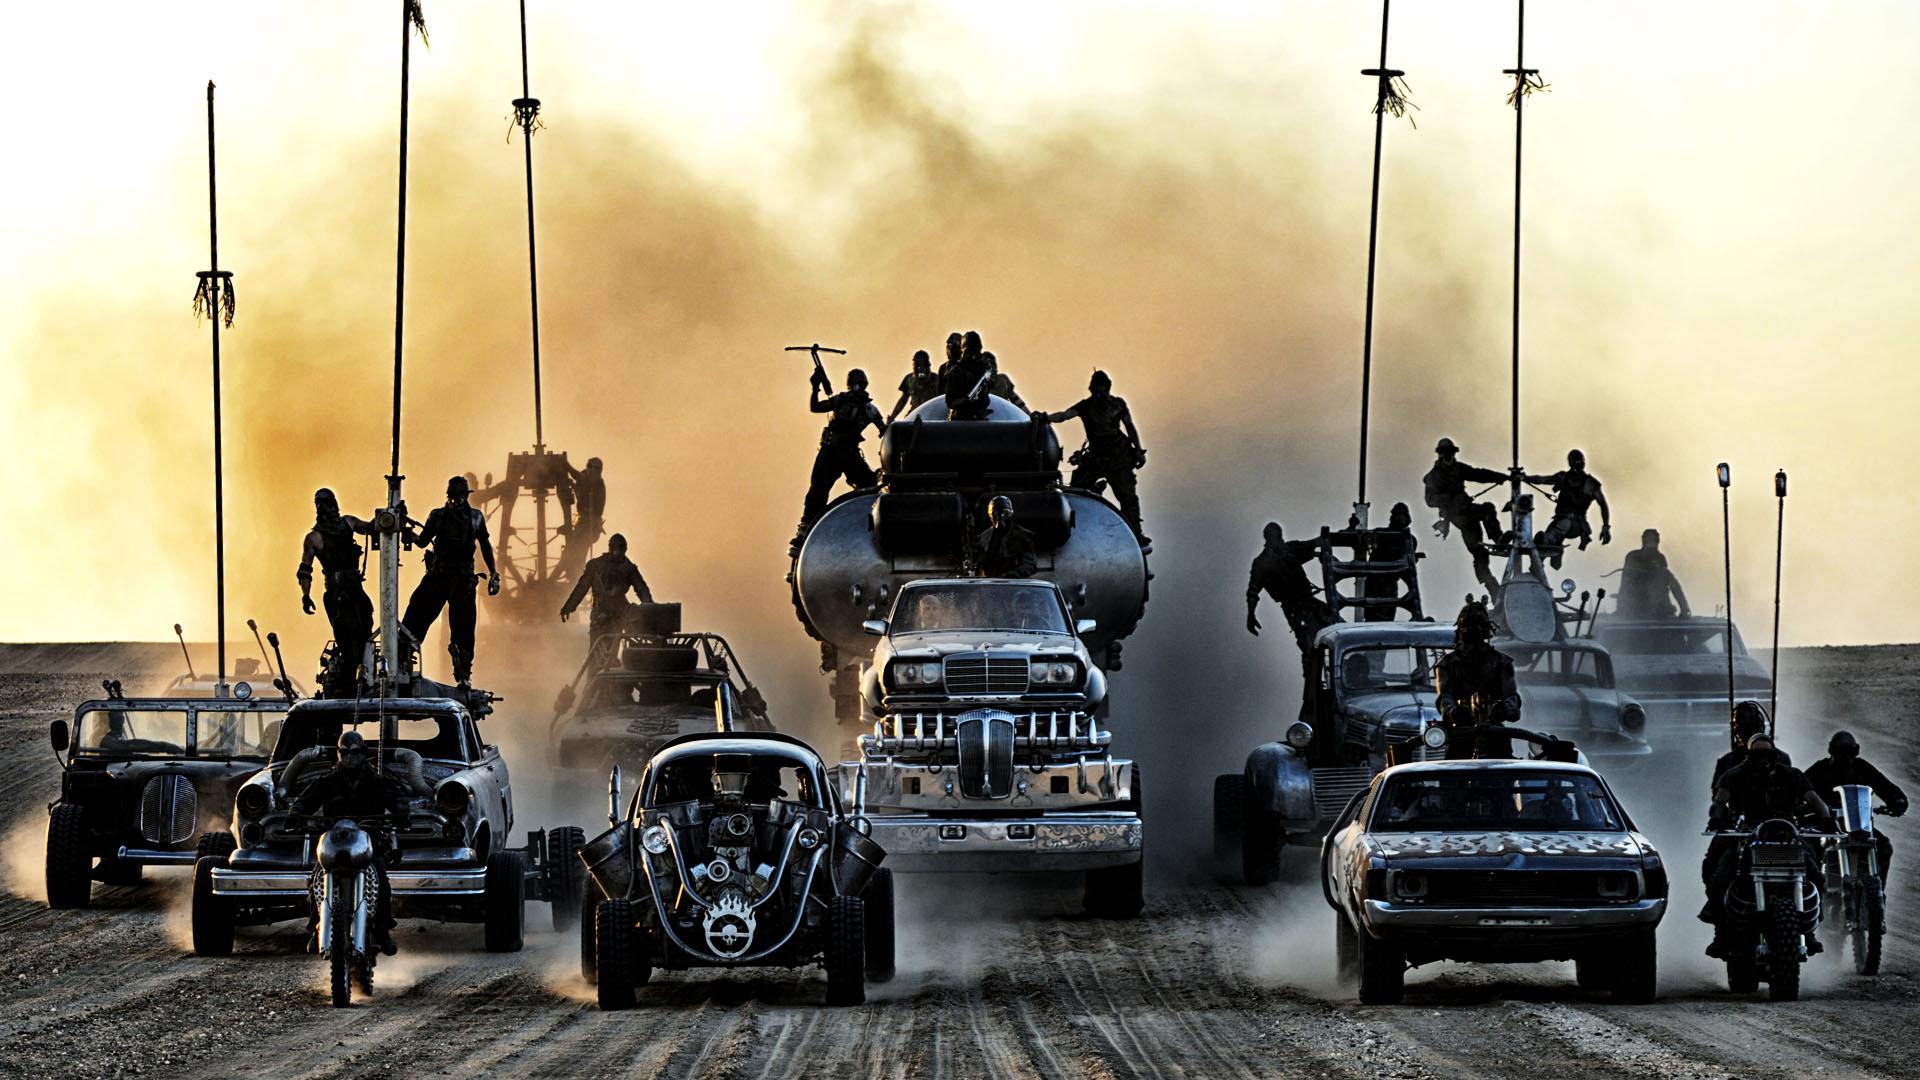 https://p3.no/filmpolitiet/wp-content/uploads/2015/05/Mad-Max-Fury-Road-bilde-5.jpg